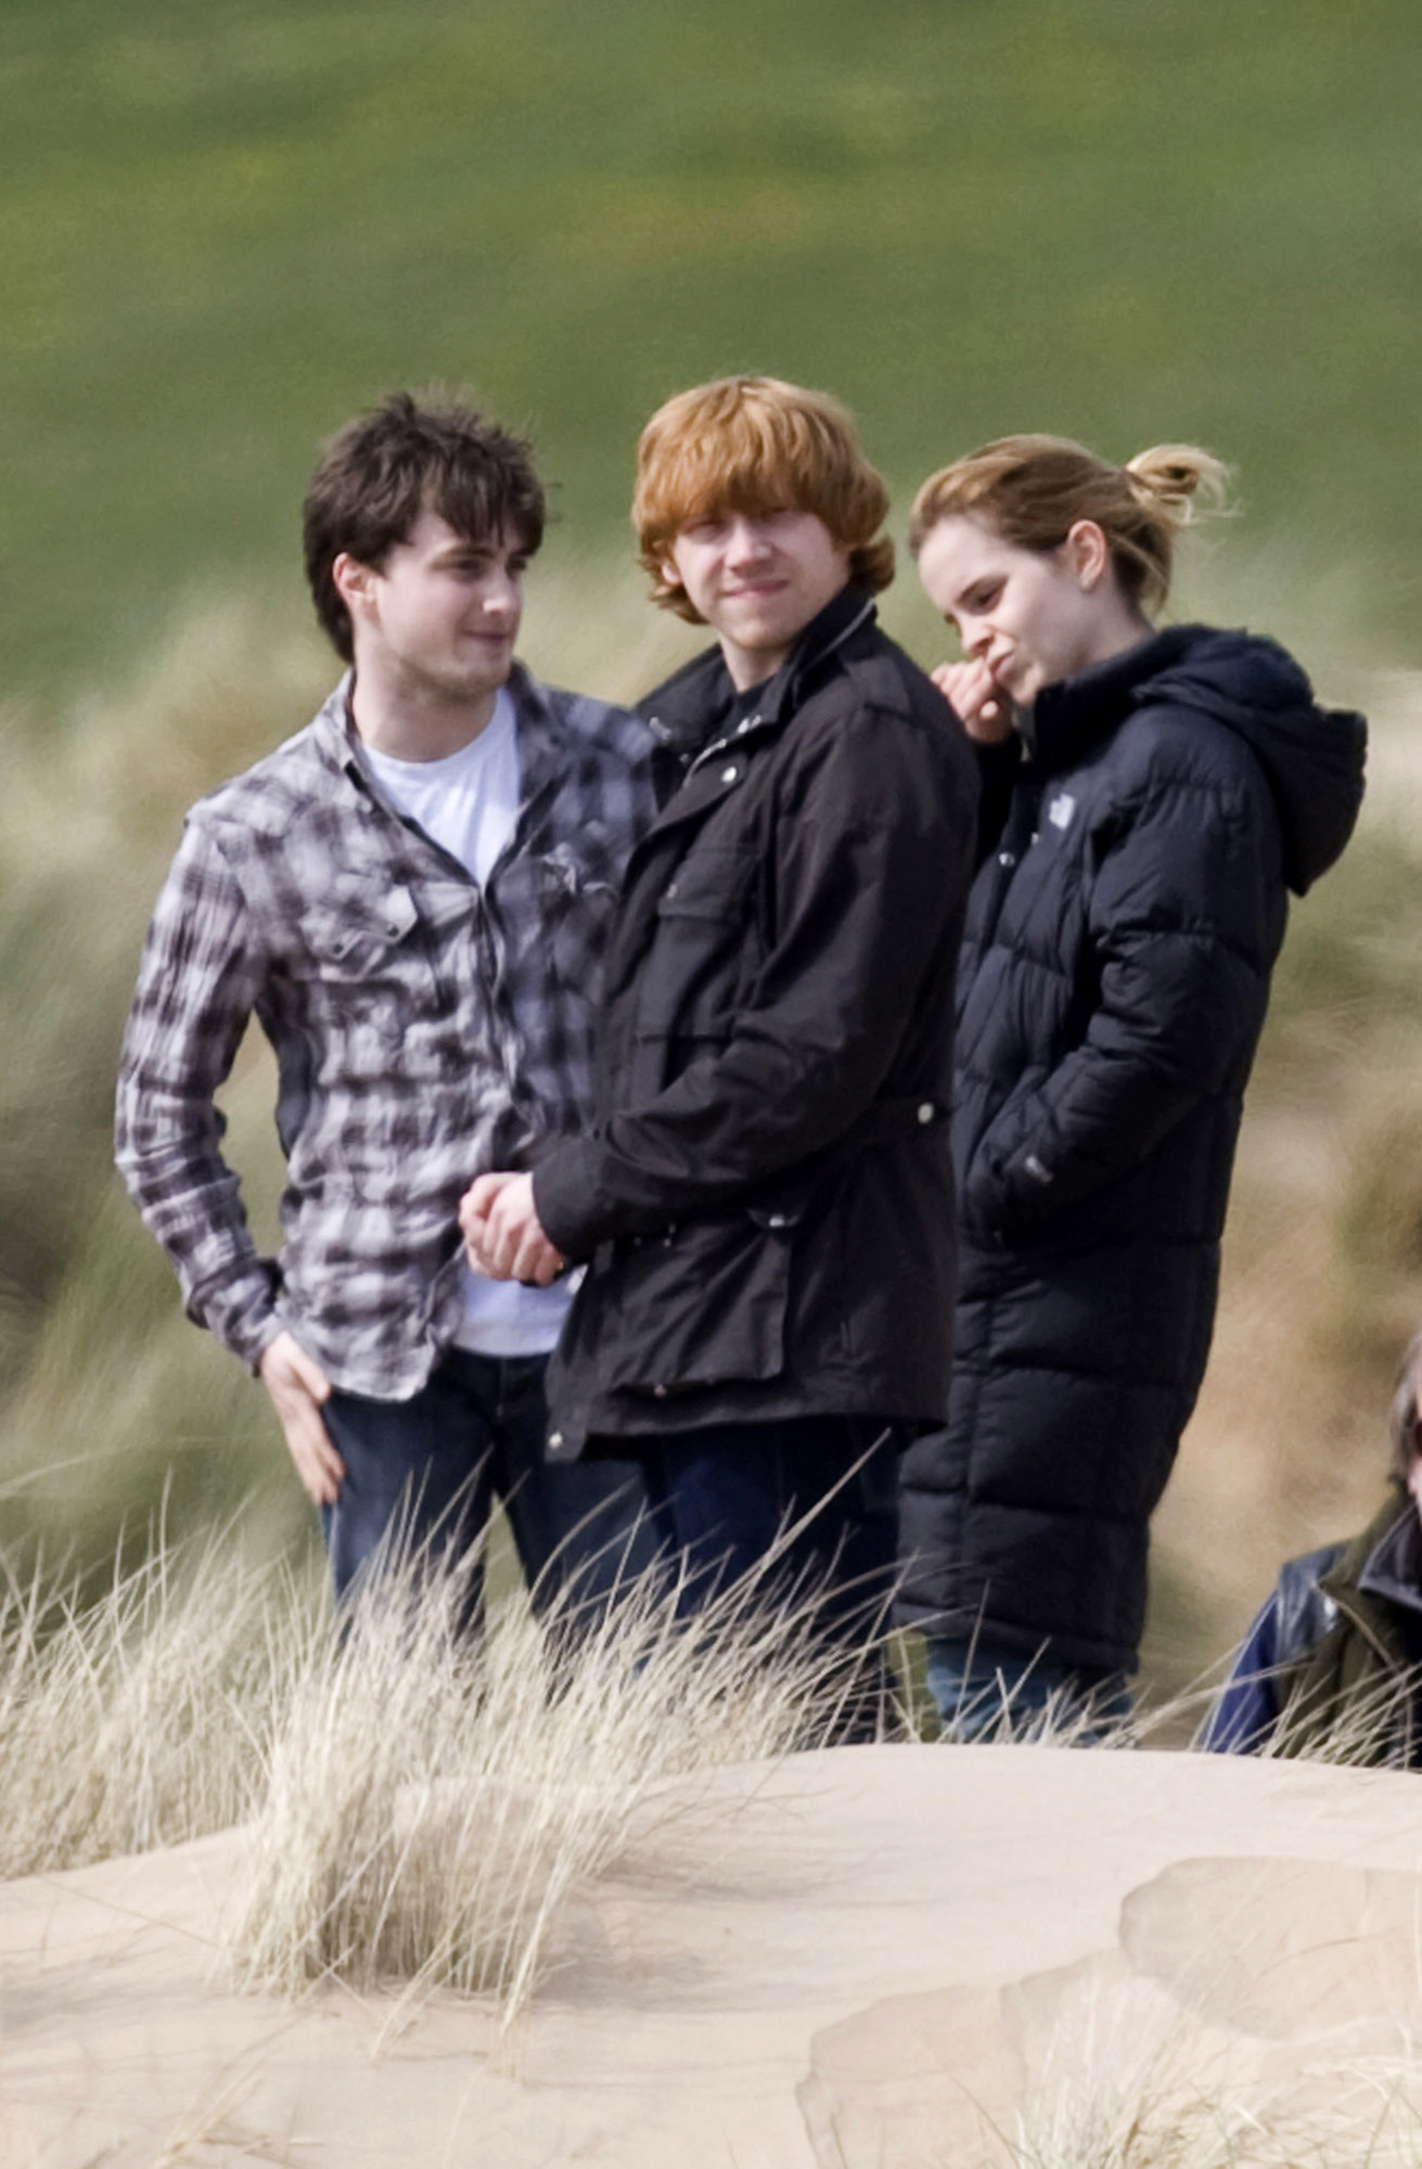 Daniel Radcliffe, Rupert Grint y Emma Watson - Reliquias de la Muerte